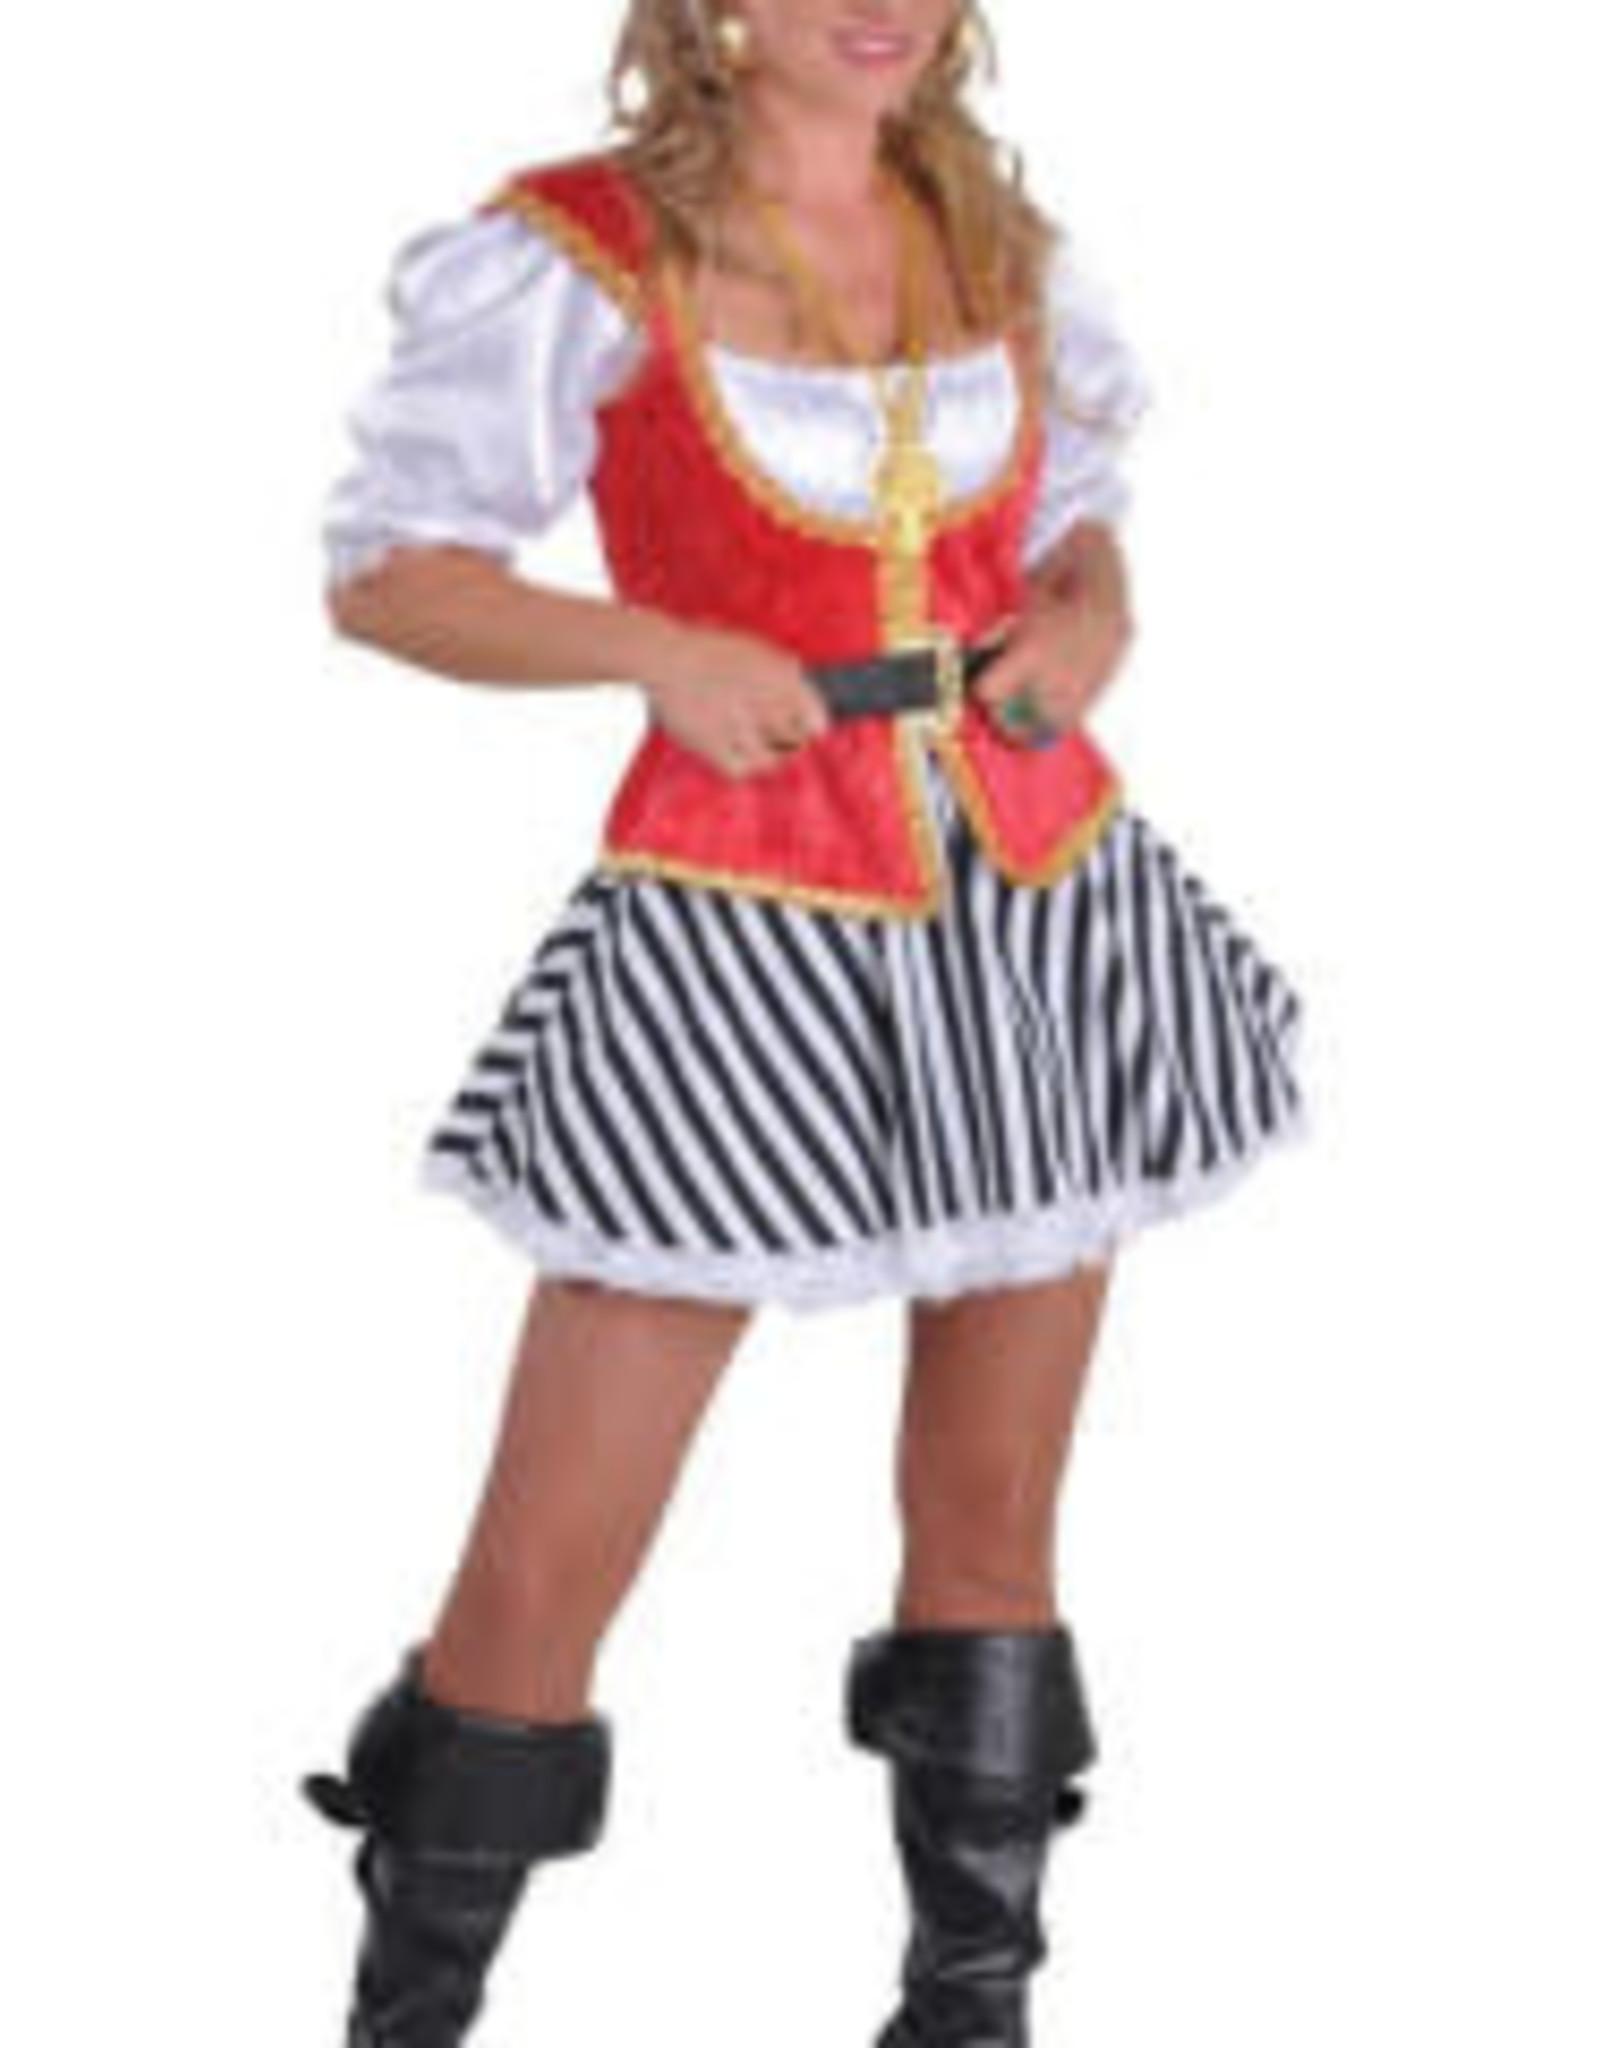 MAGIC piratendame sexy huurprijs € 15